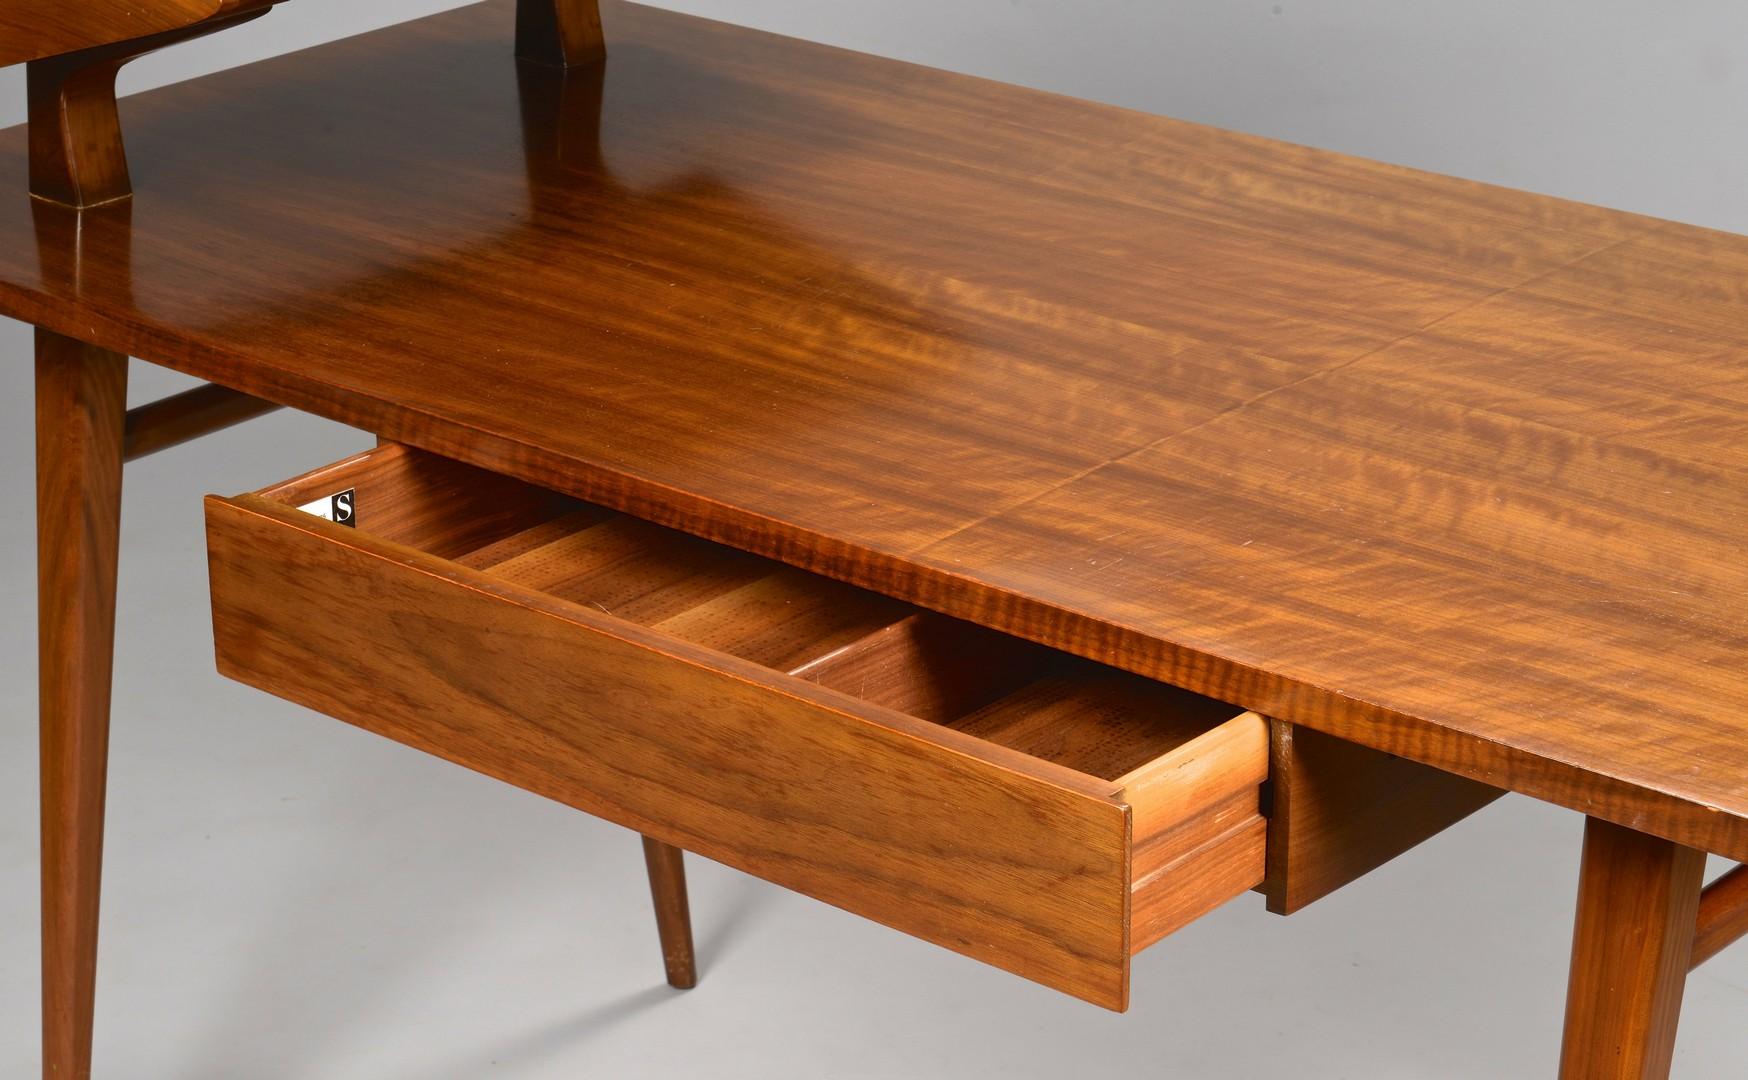 Lot 308: Bertha Schaefer Midcentury Modern Desk